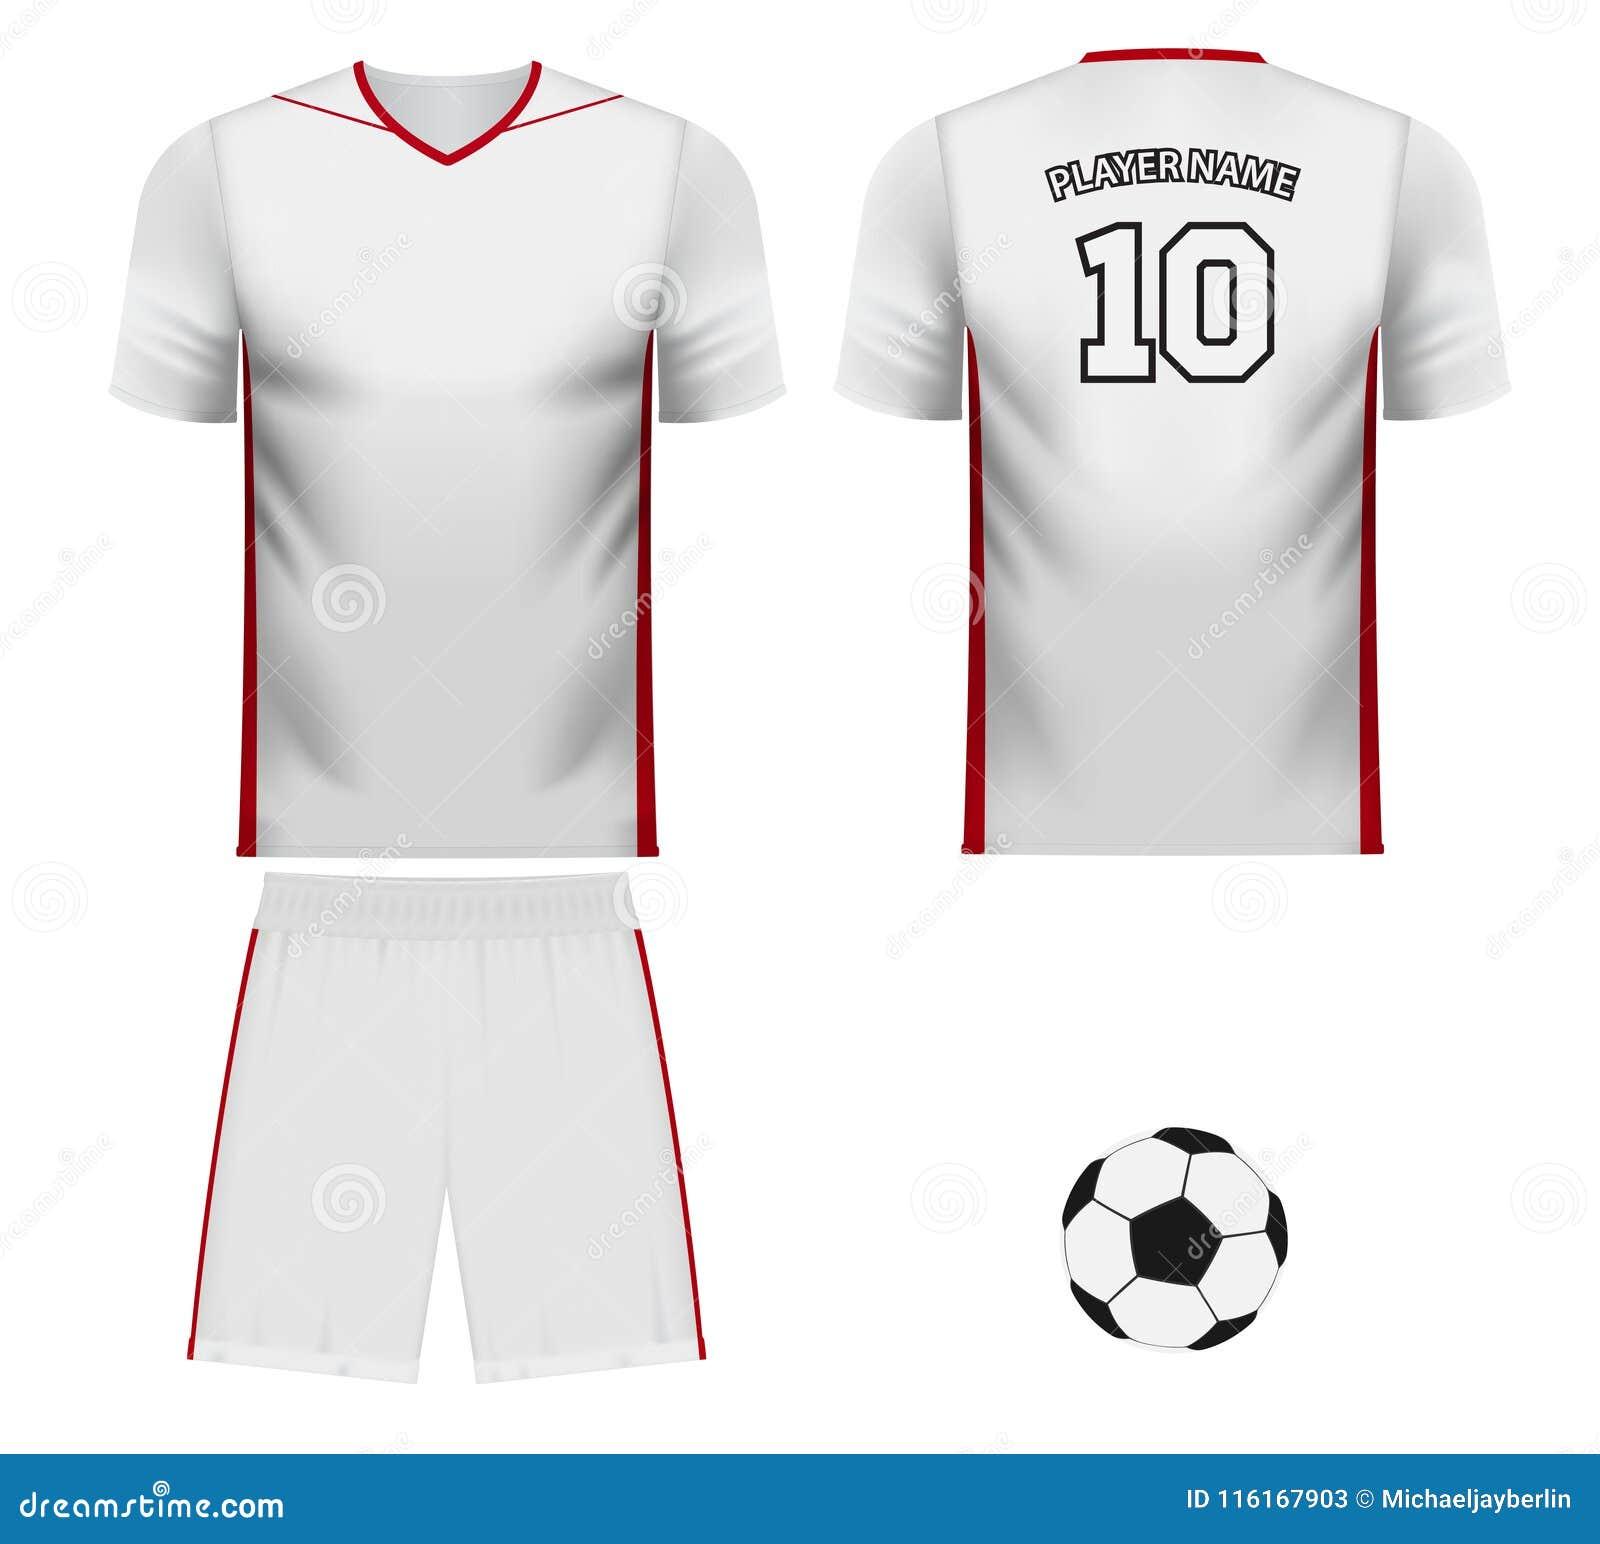 new arrival d5272 47f40 Iran National Team Jersey Fan Apparel Stock Illustration ...